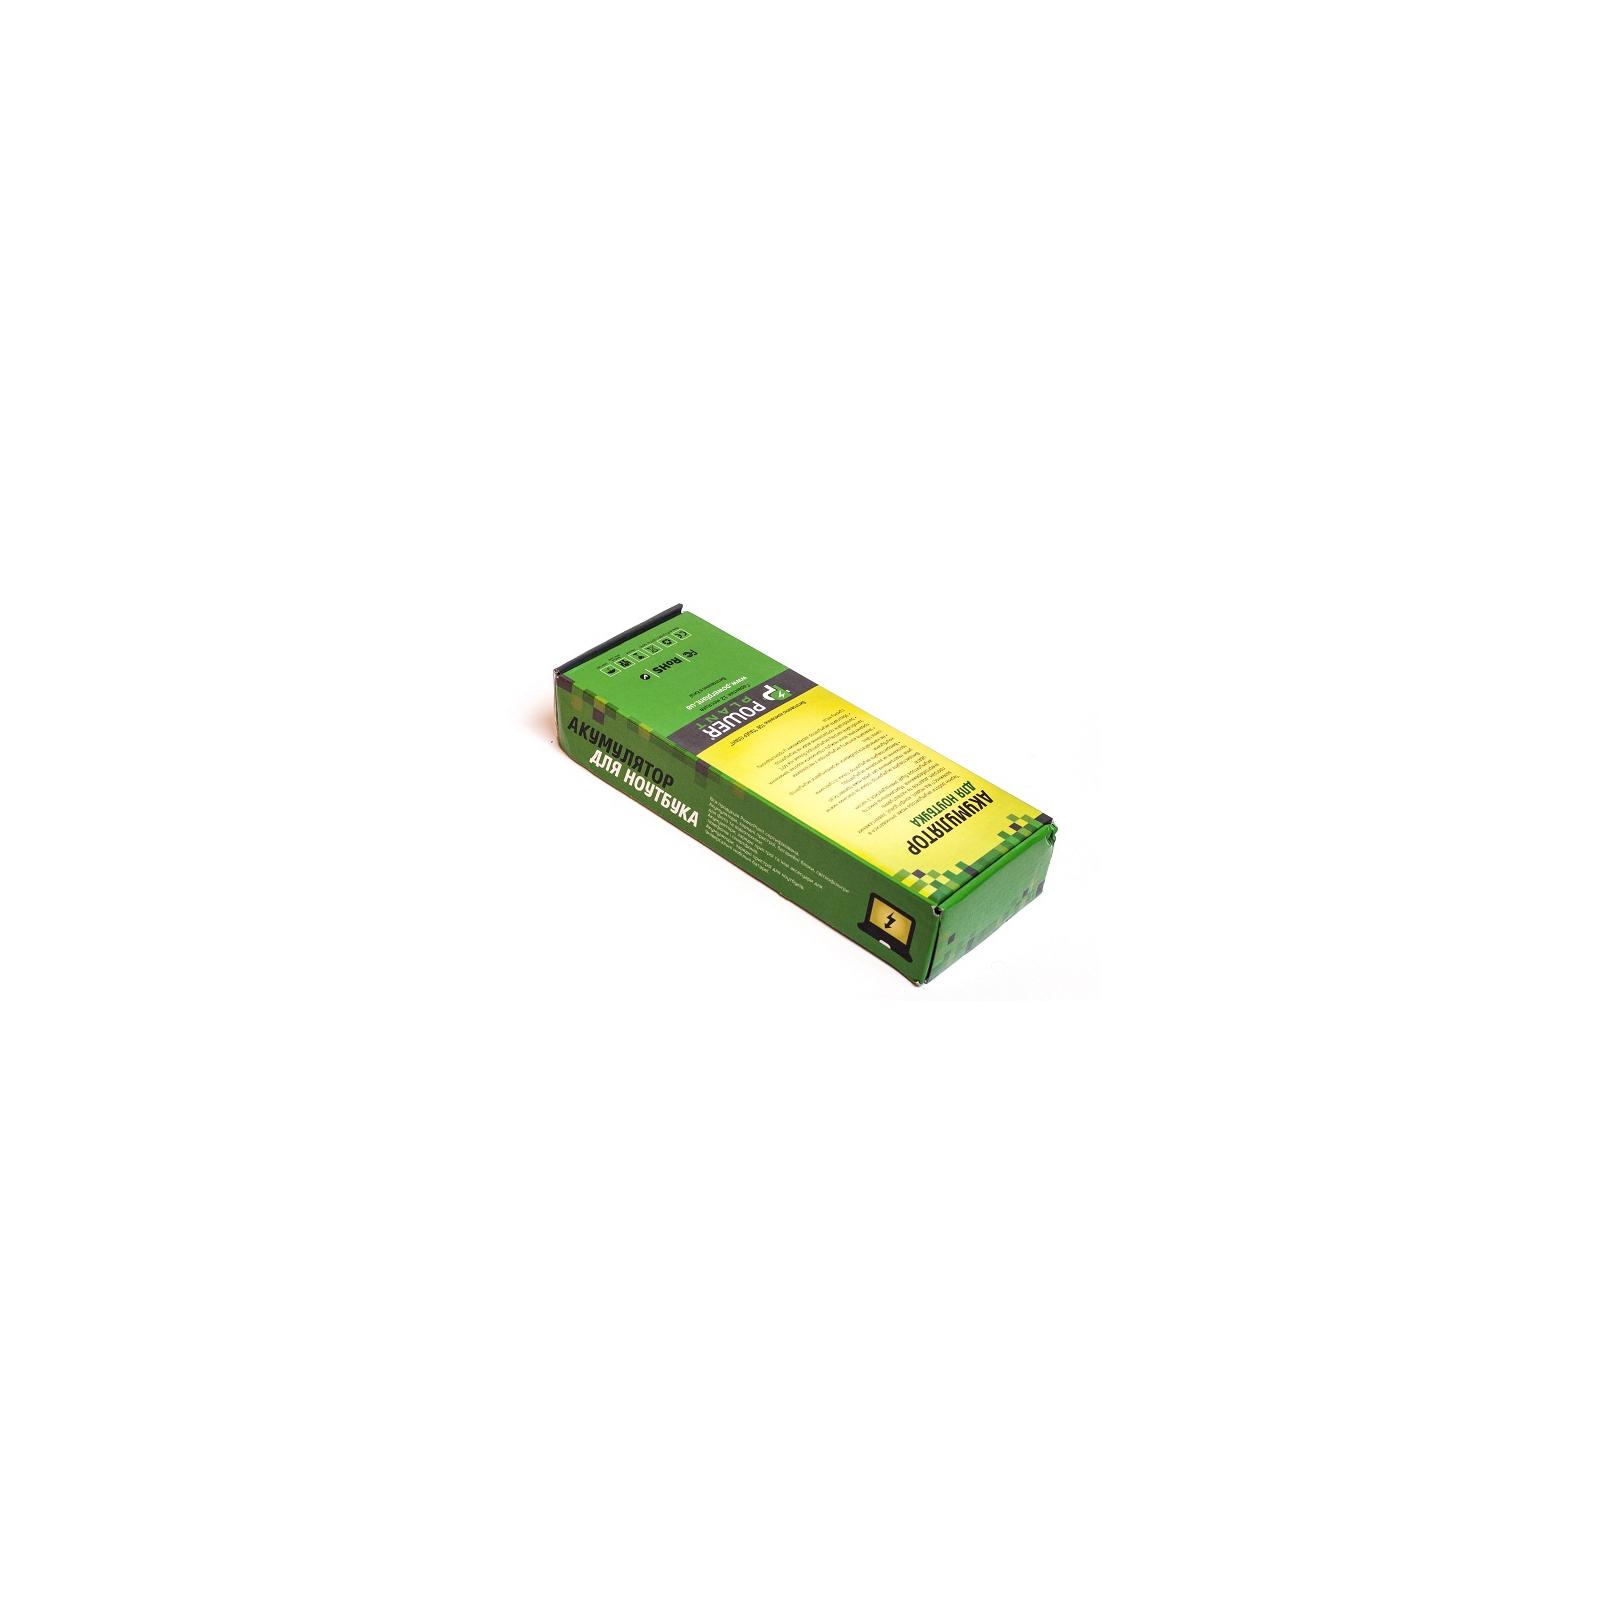 Аккумулятор для ноутбука IBM G430(ASM 42T4586, LOG530LH) 11.1V 5200mAh PowerPlant (NB00000042) изображение 2